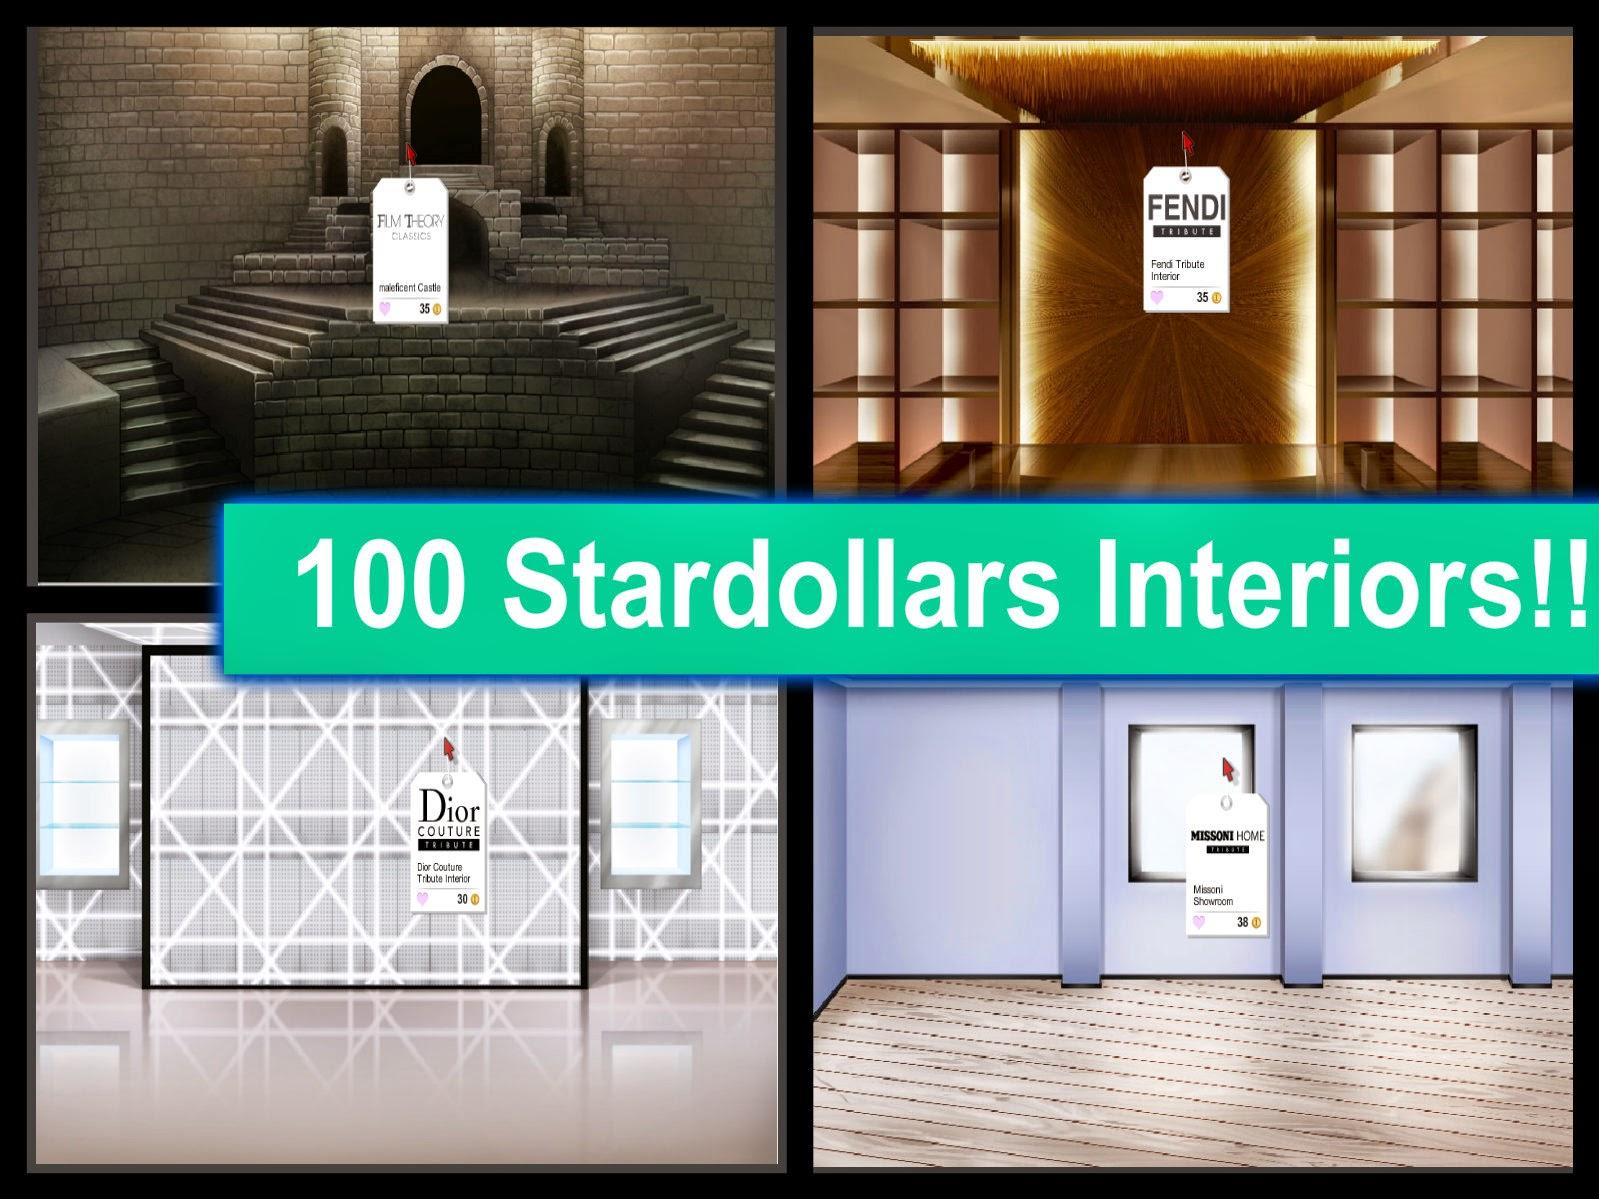 how to get free stardollars on stardoll 2014